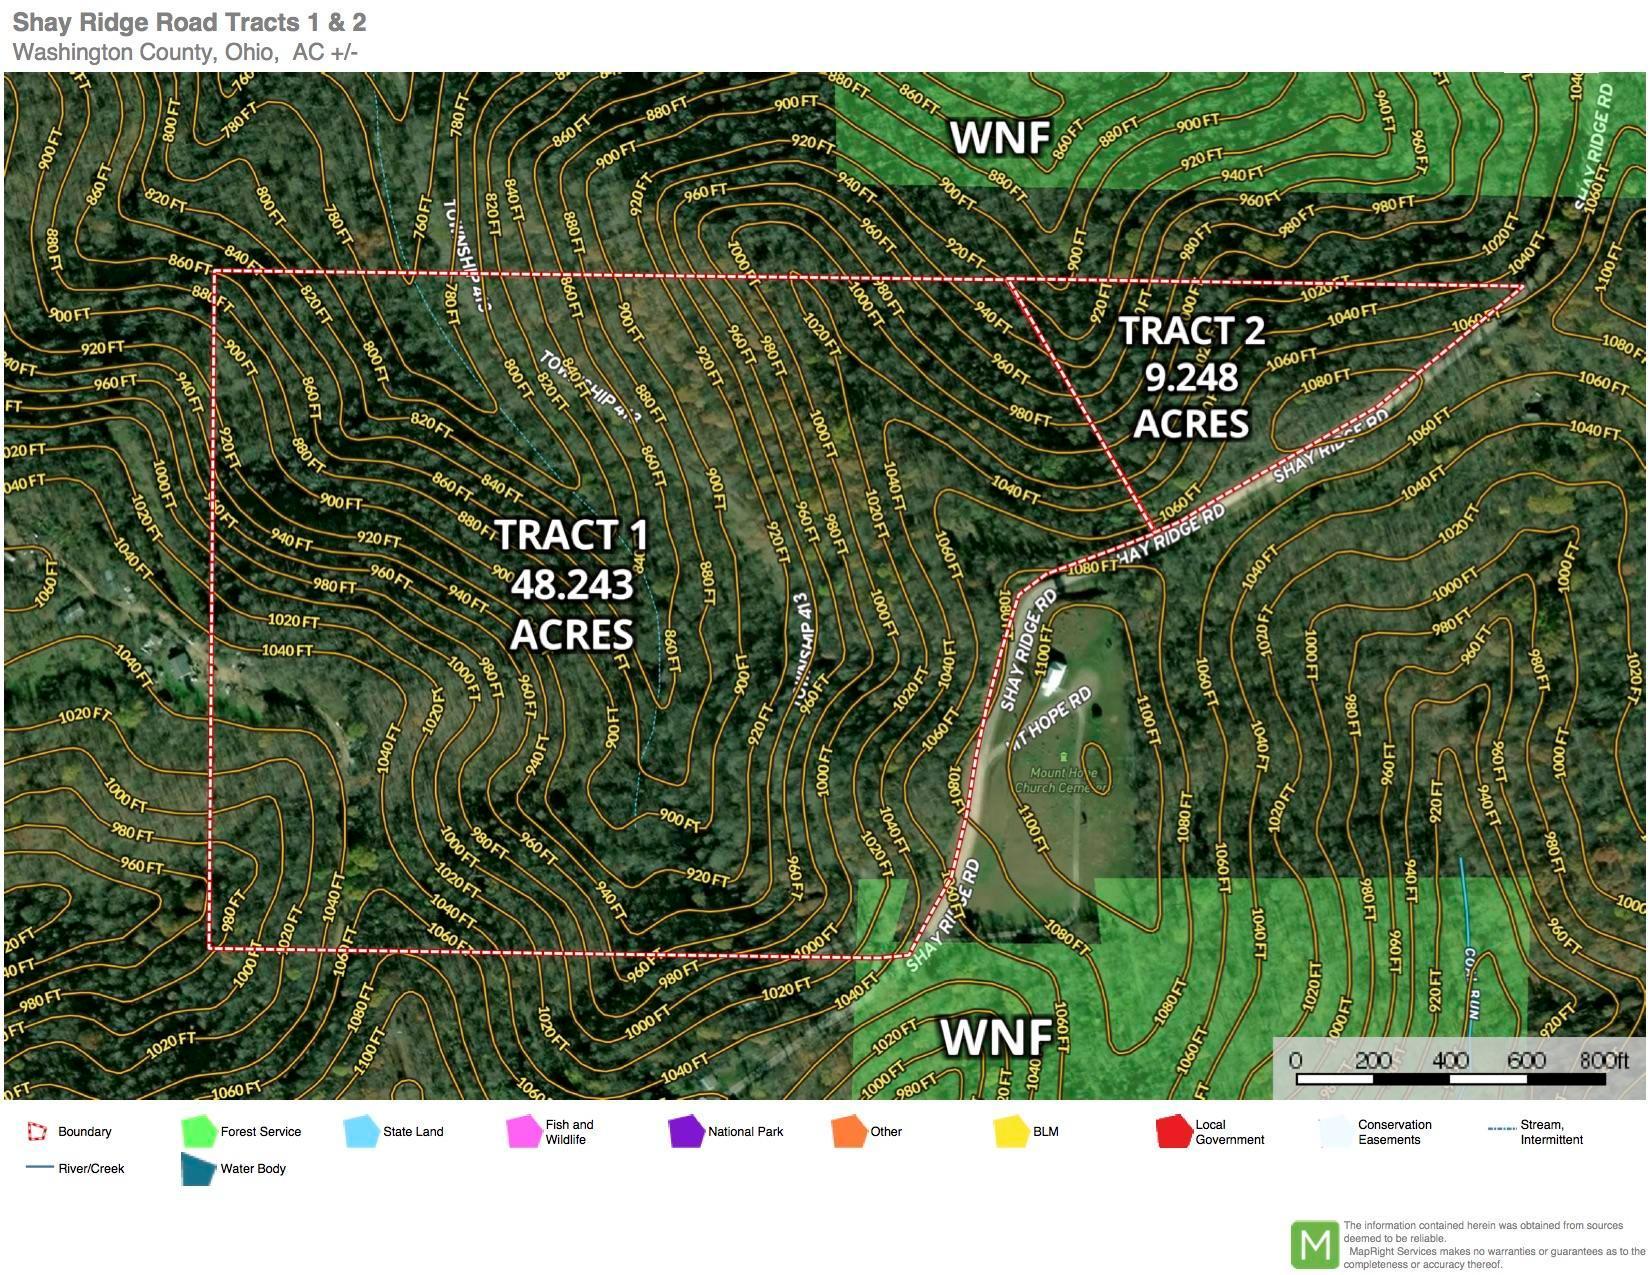 Shay Ridge Aerial